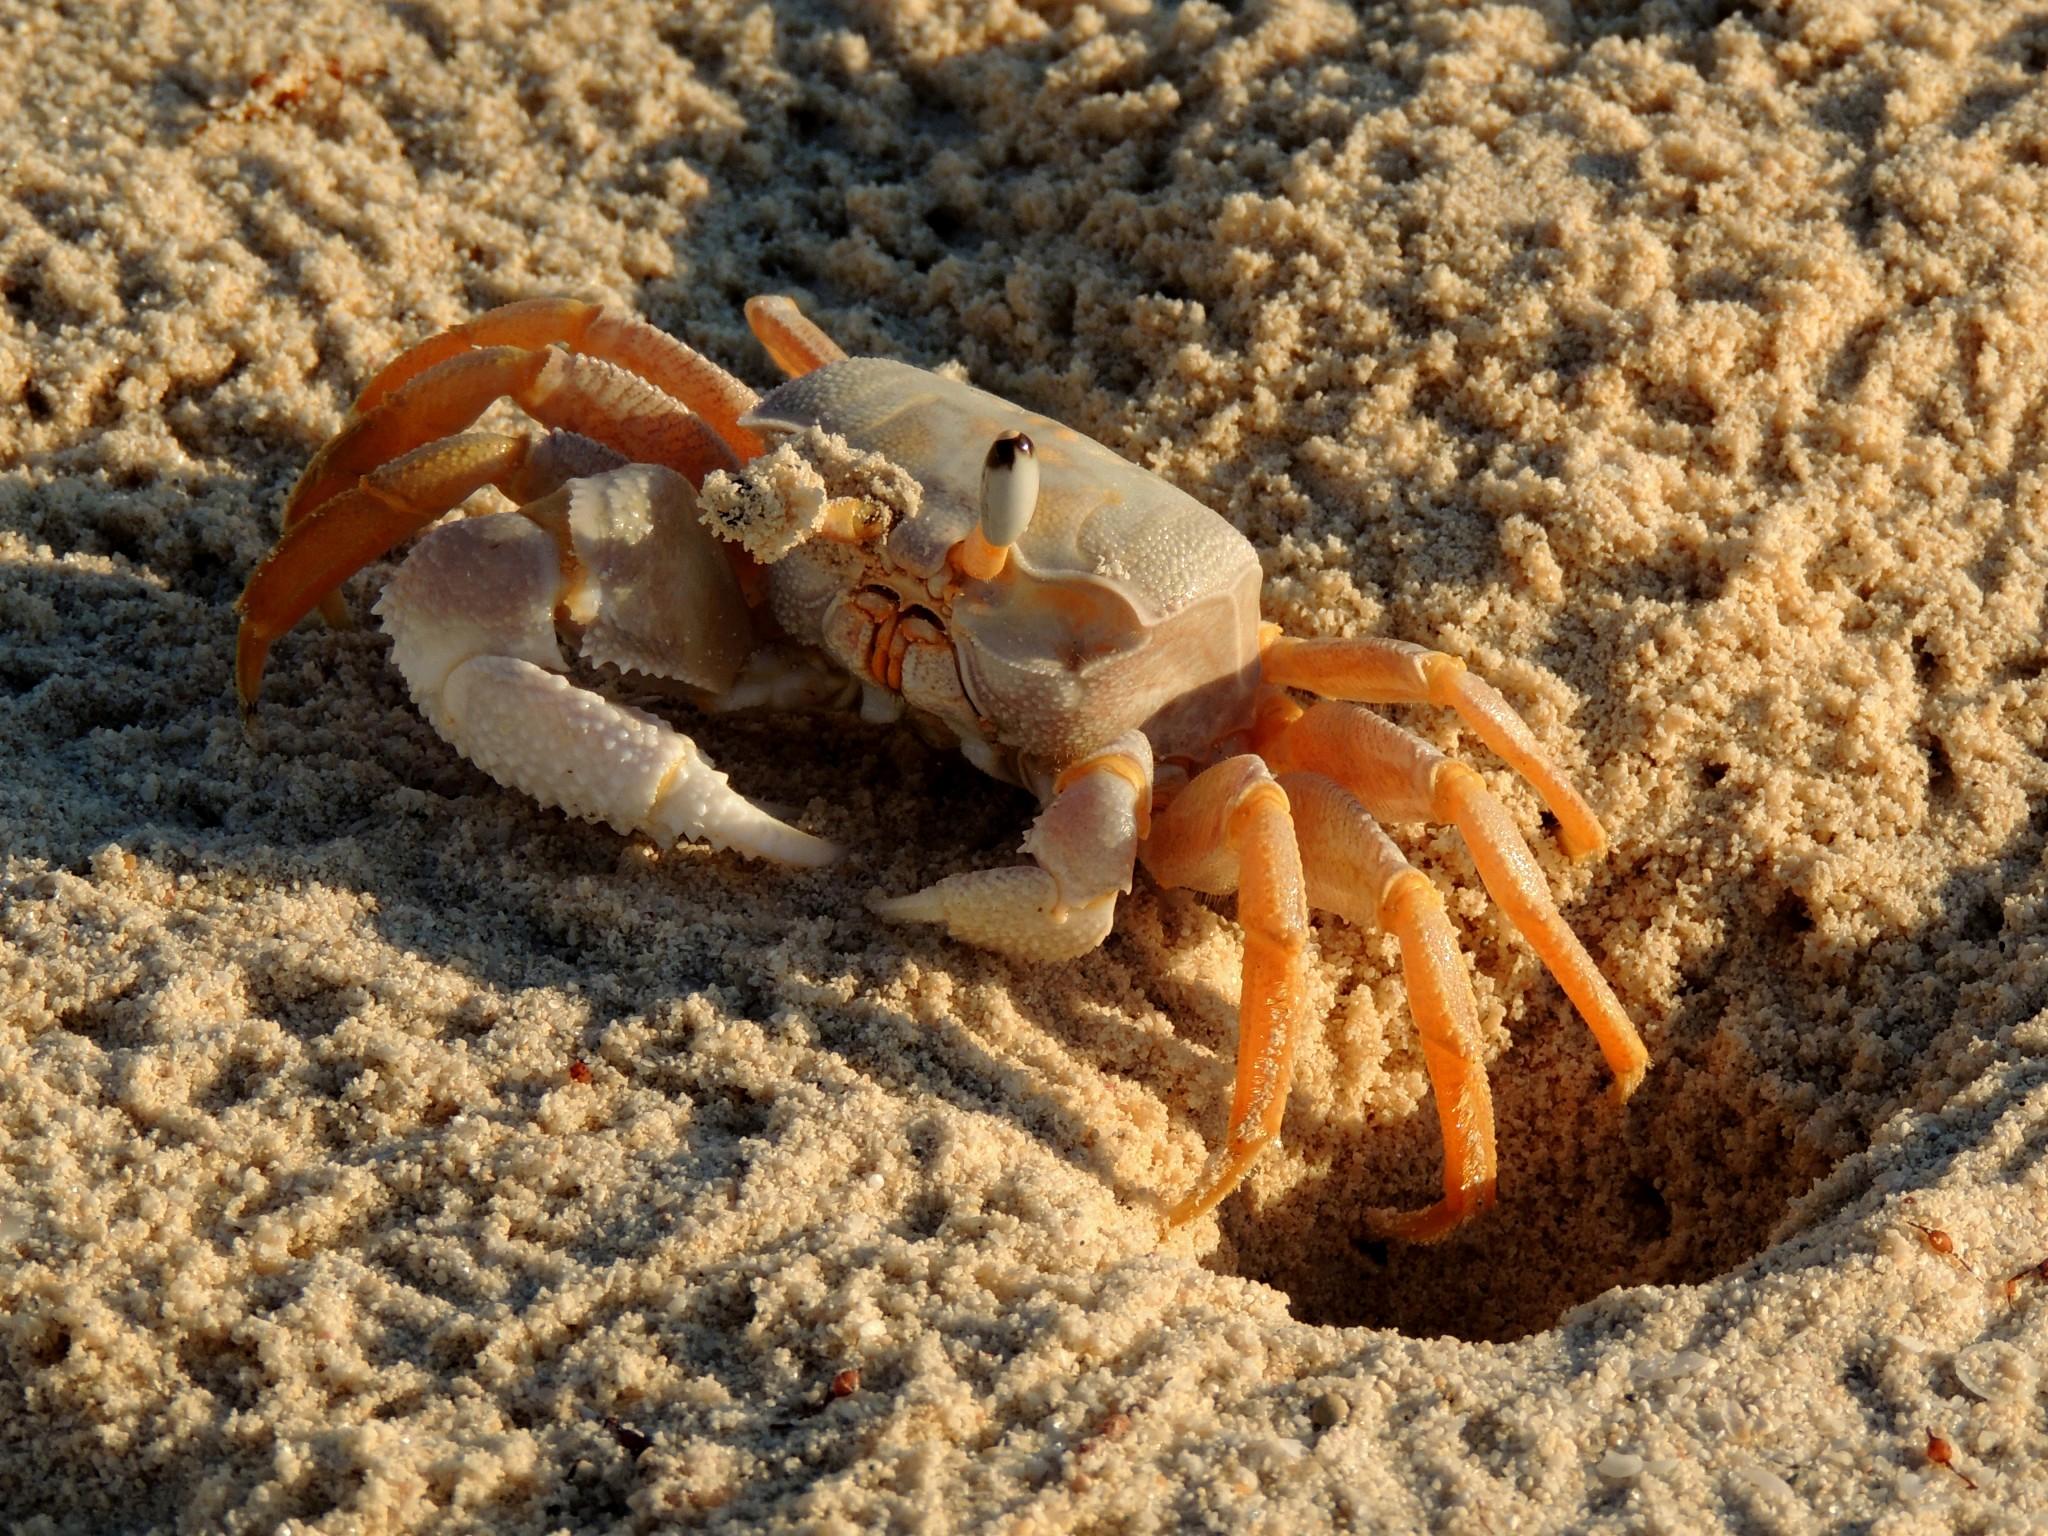 Madagascar, Kleine krab op het prachtige strand van Mikea,.